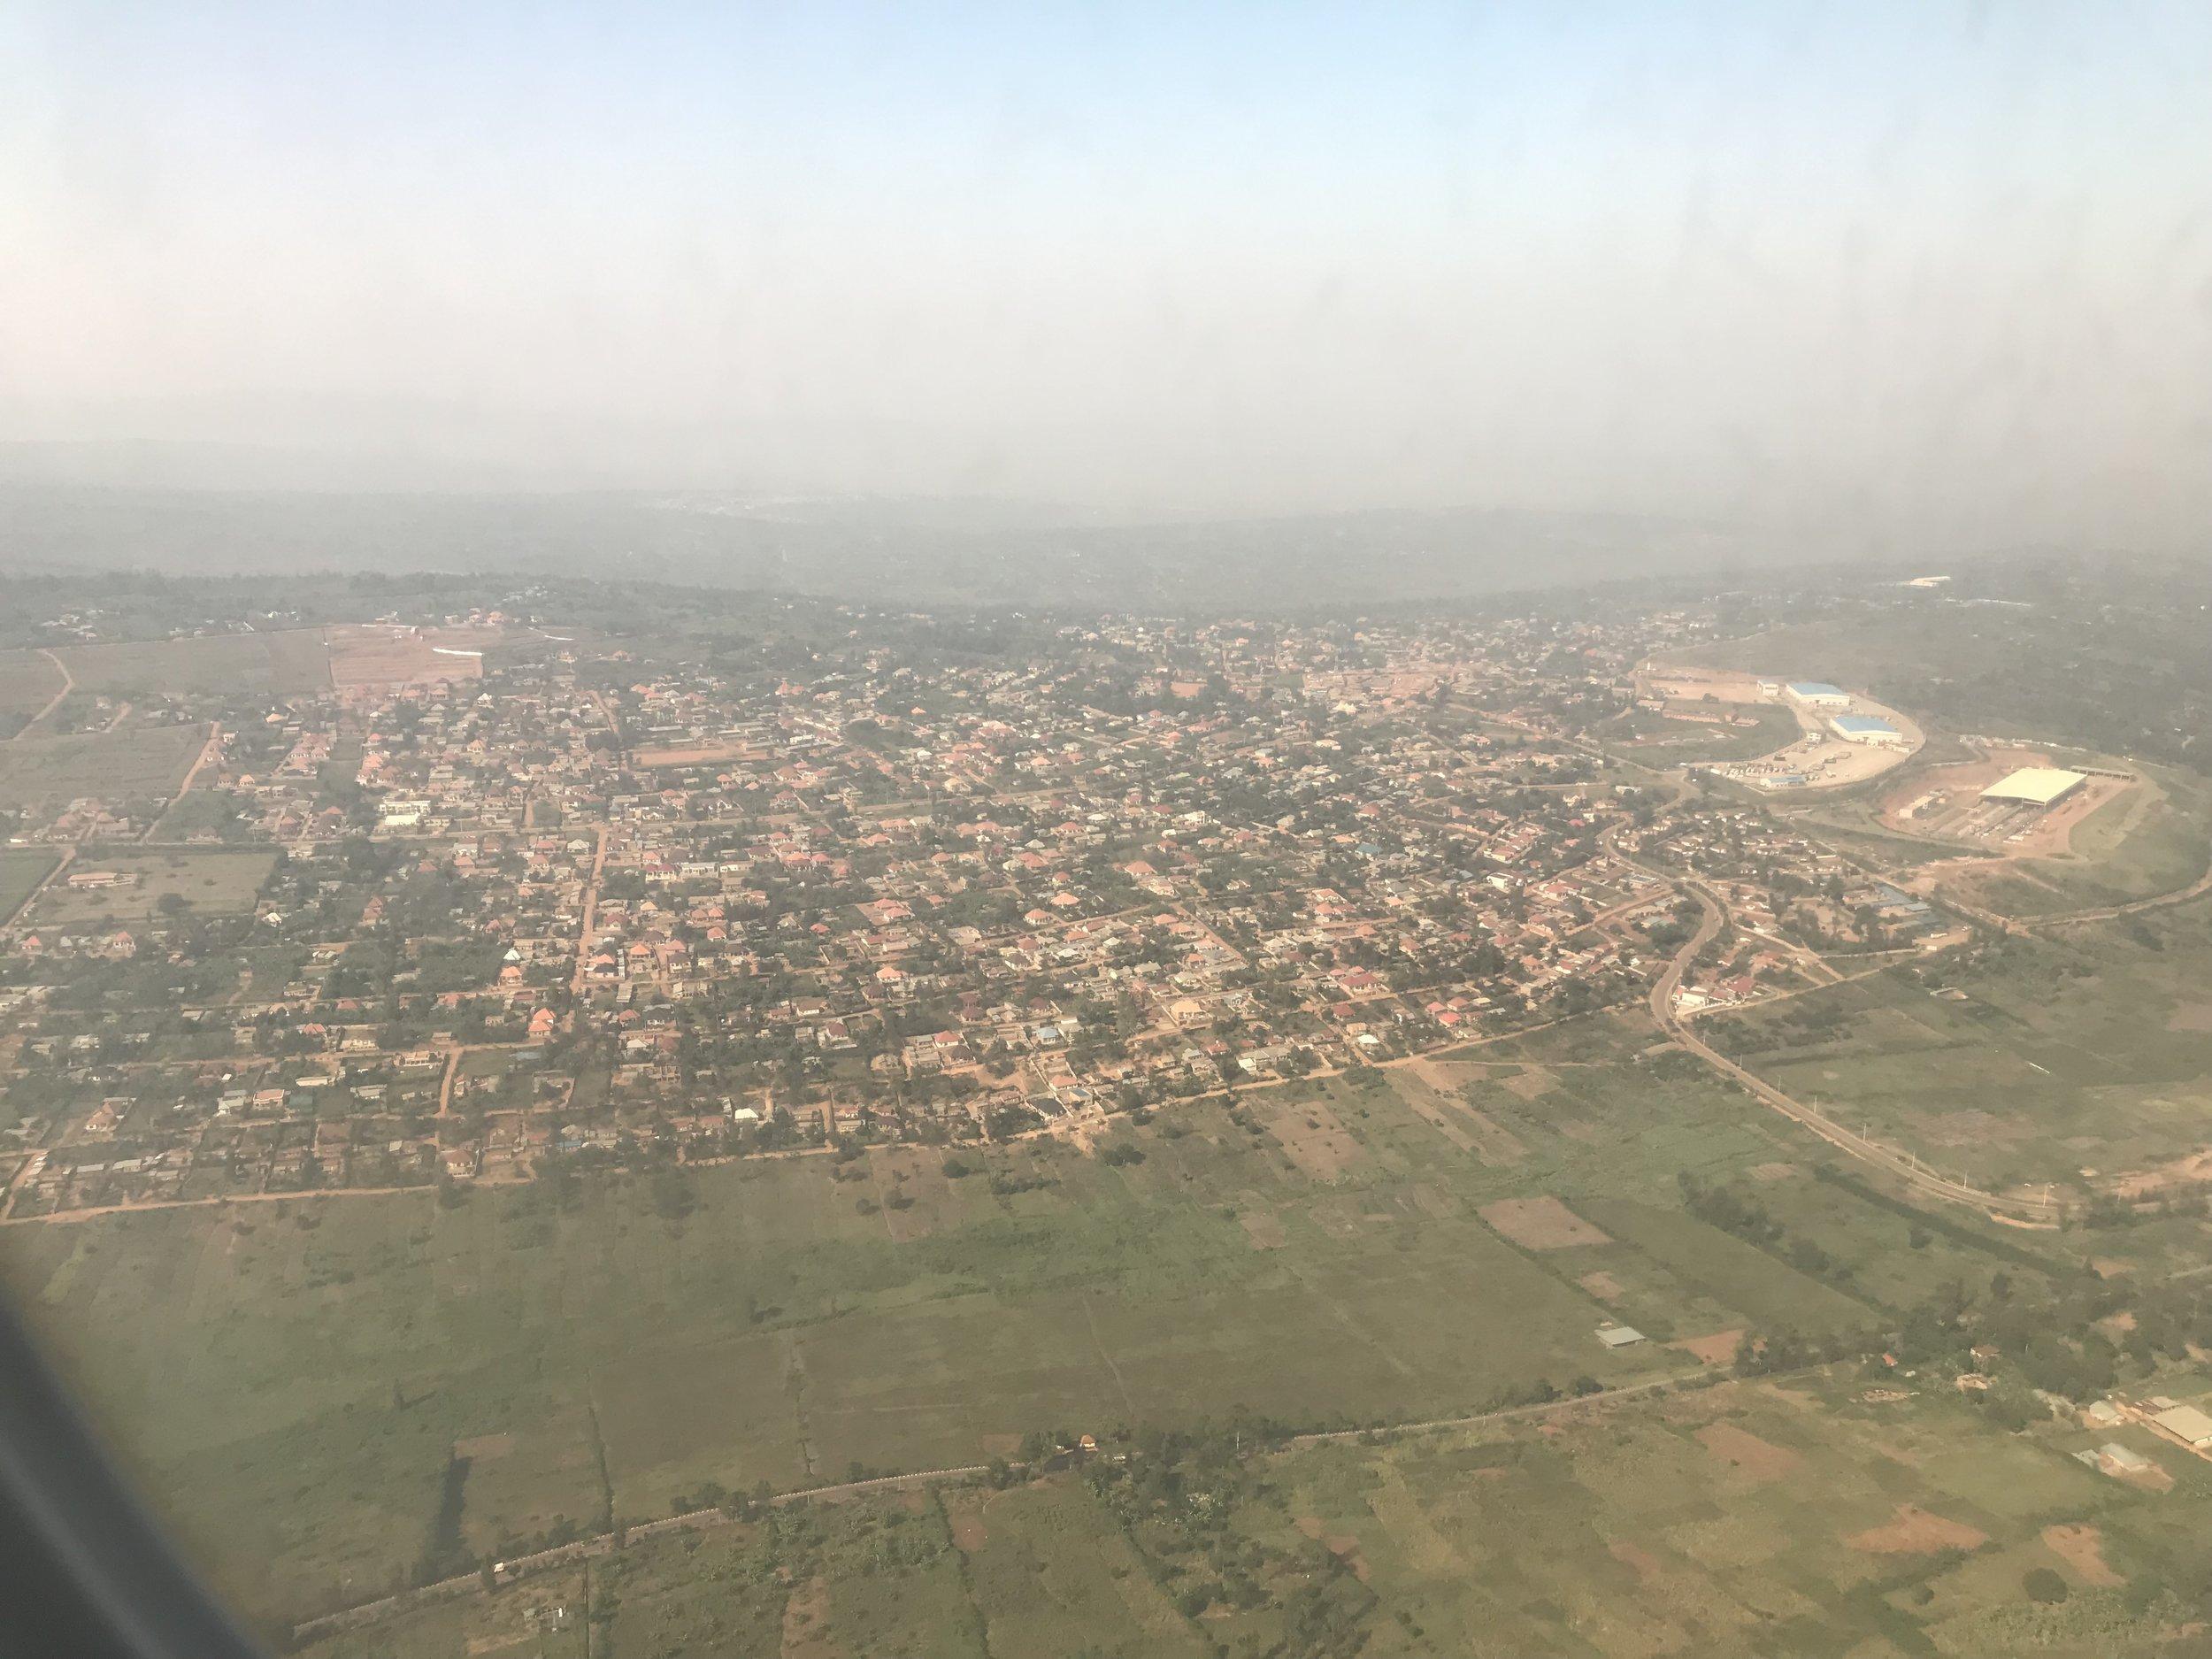 IMG_5568VickieRemoe-travel-kigali-rwanda-review-kwibohora25-hotels-africa.JPG